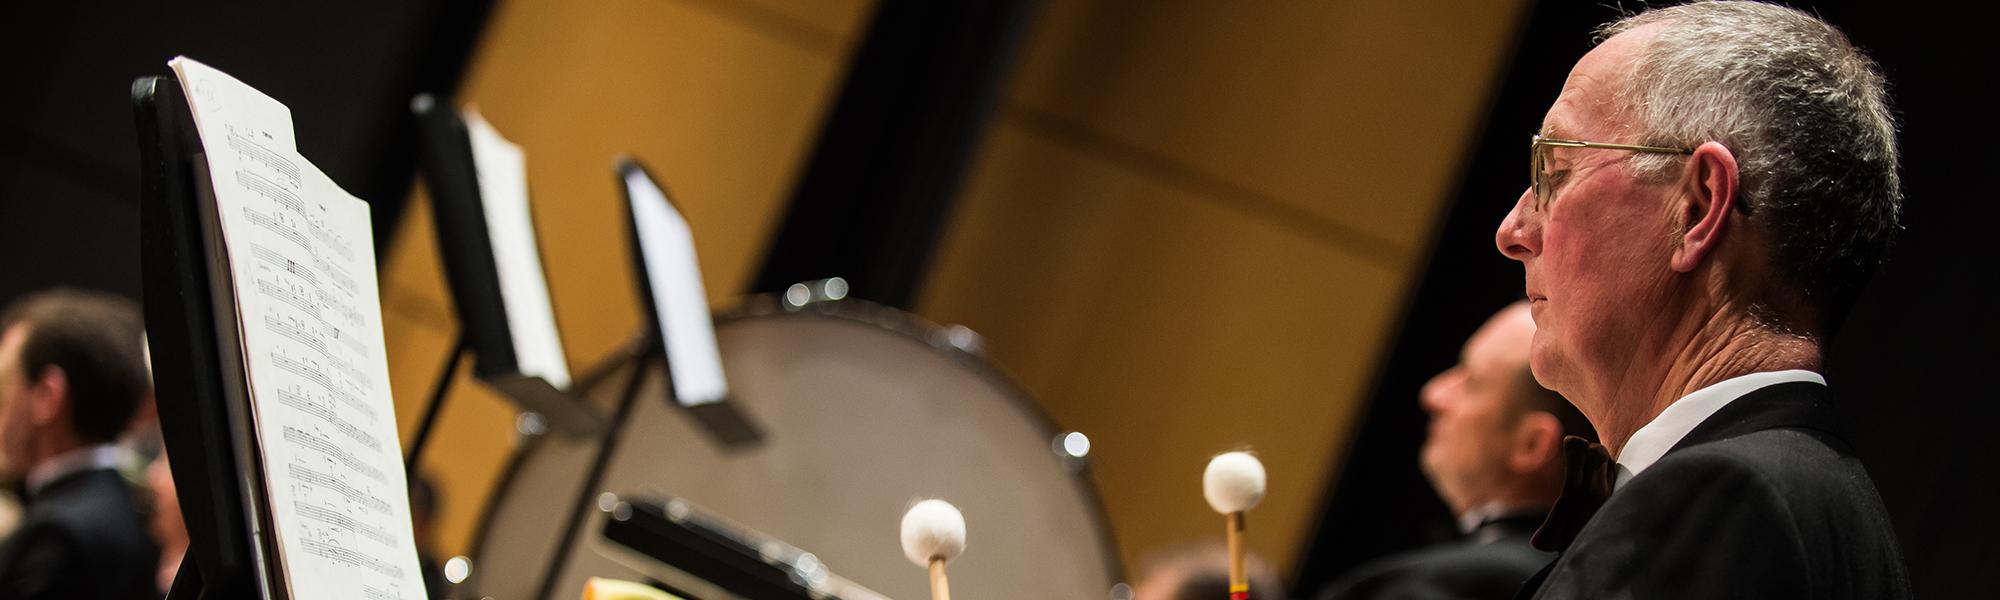 dHPO, music, performance